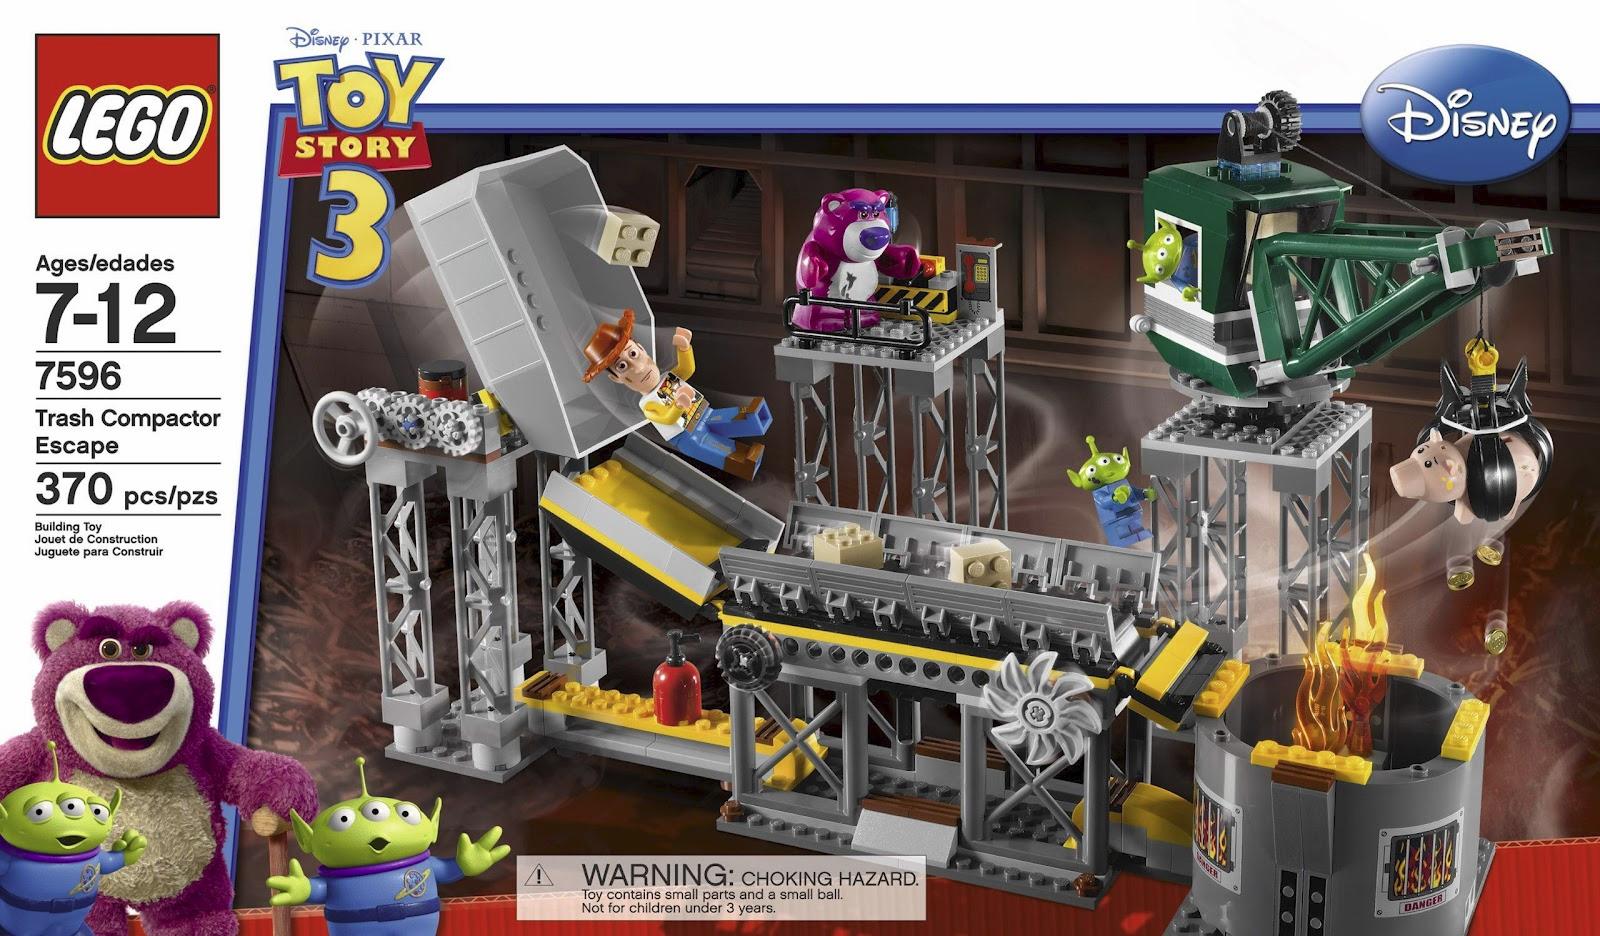 Lego Toy 3 : Trash compactor escape brickipedia fandom powered